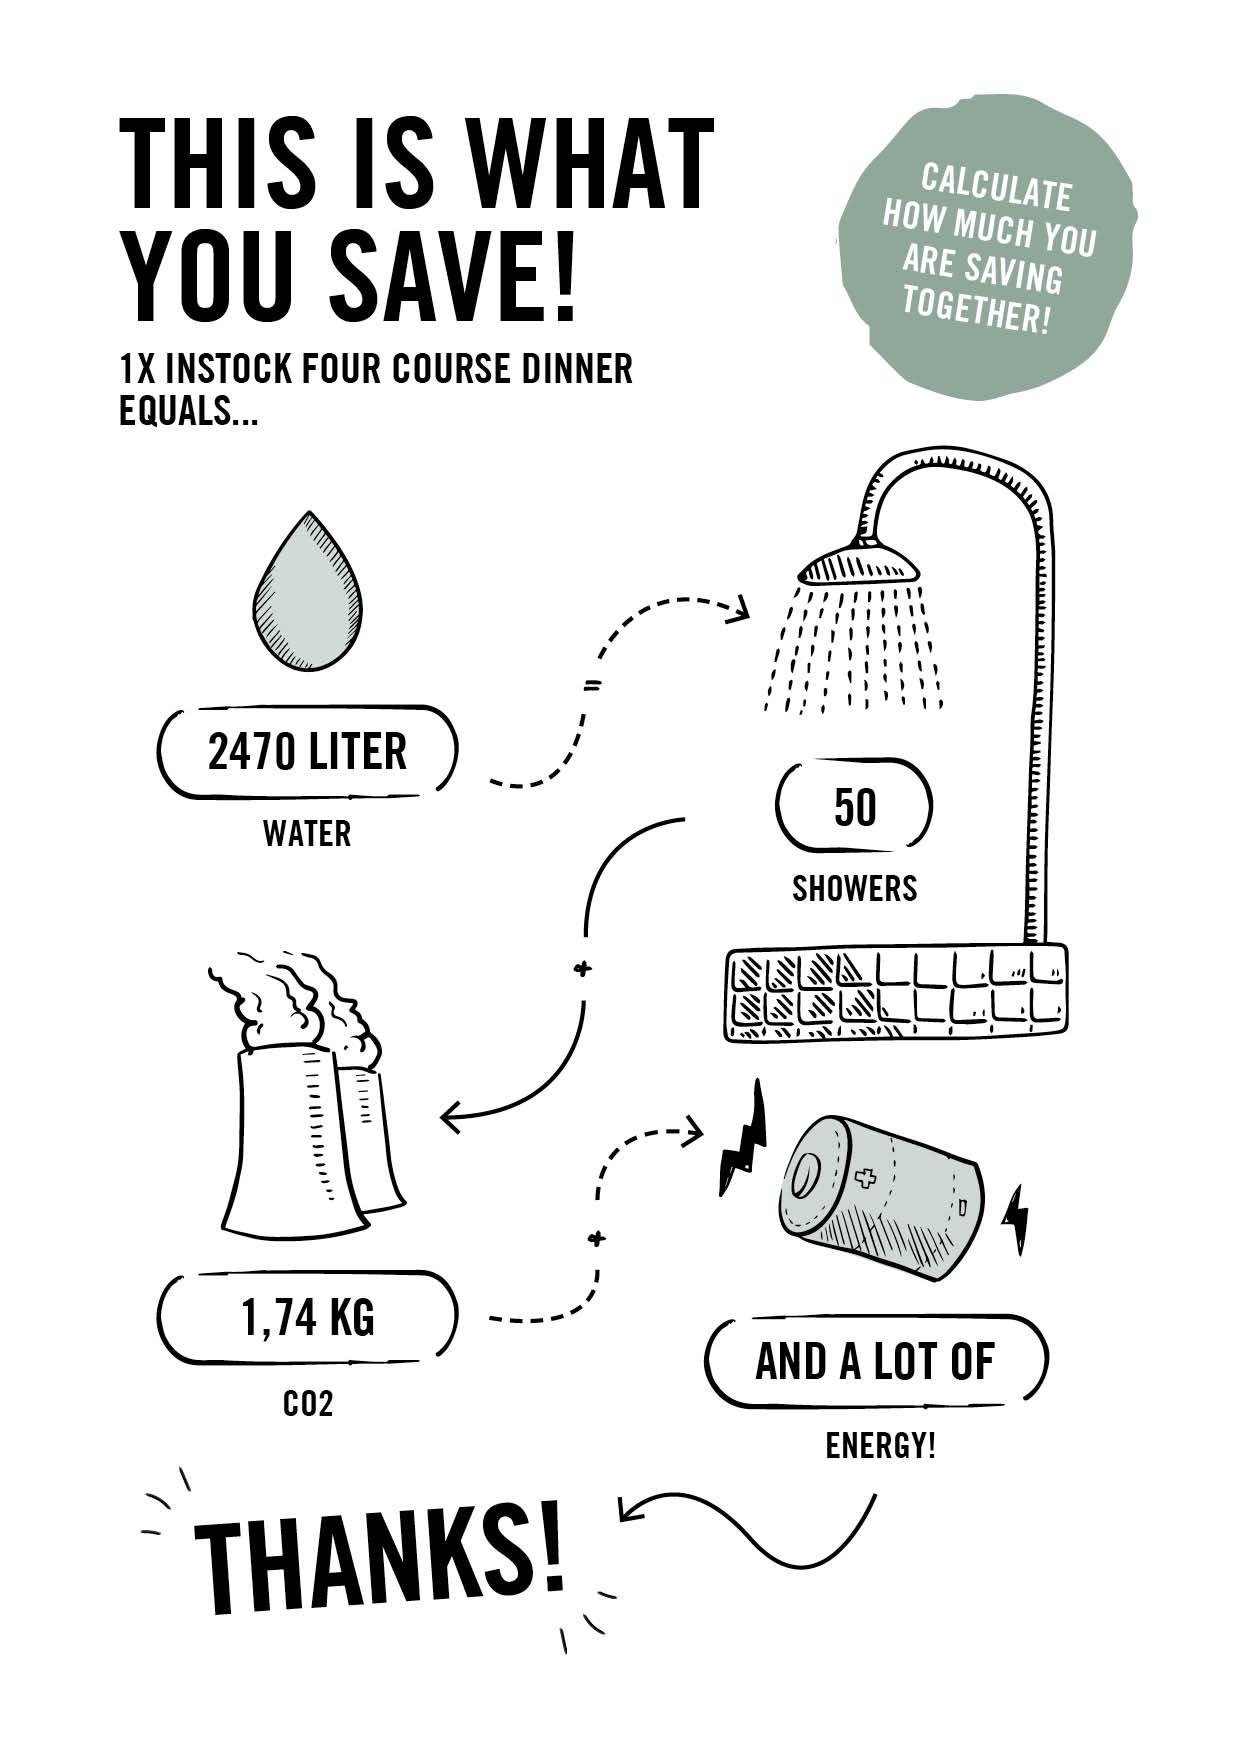 impact of food waste